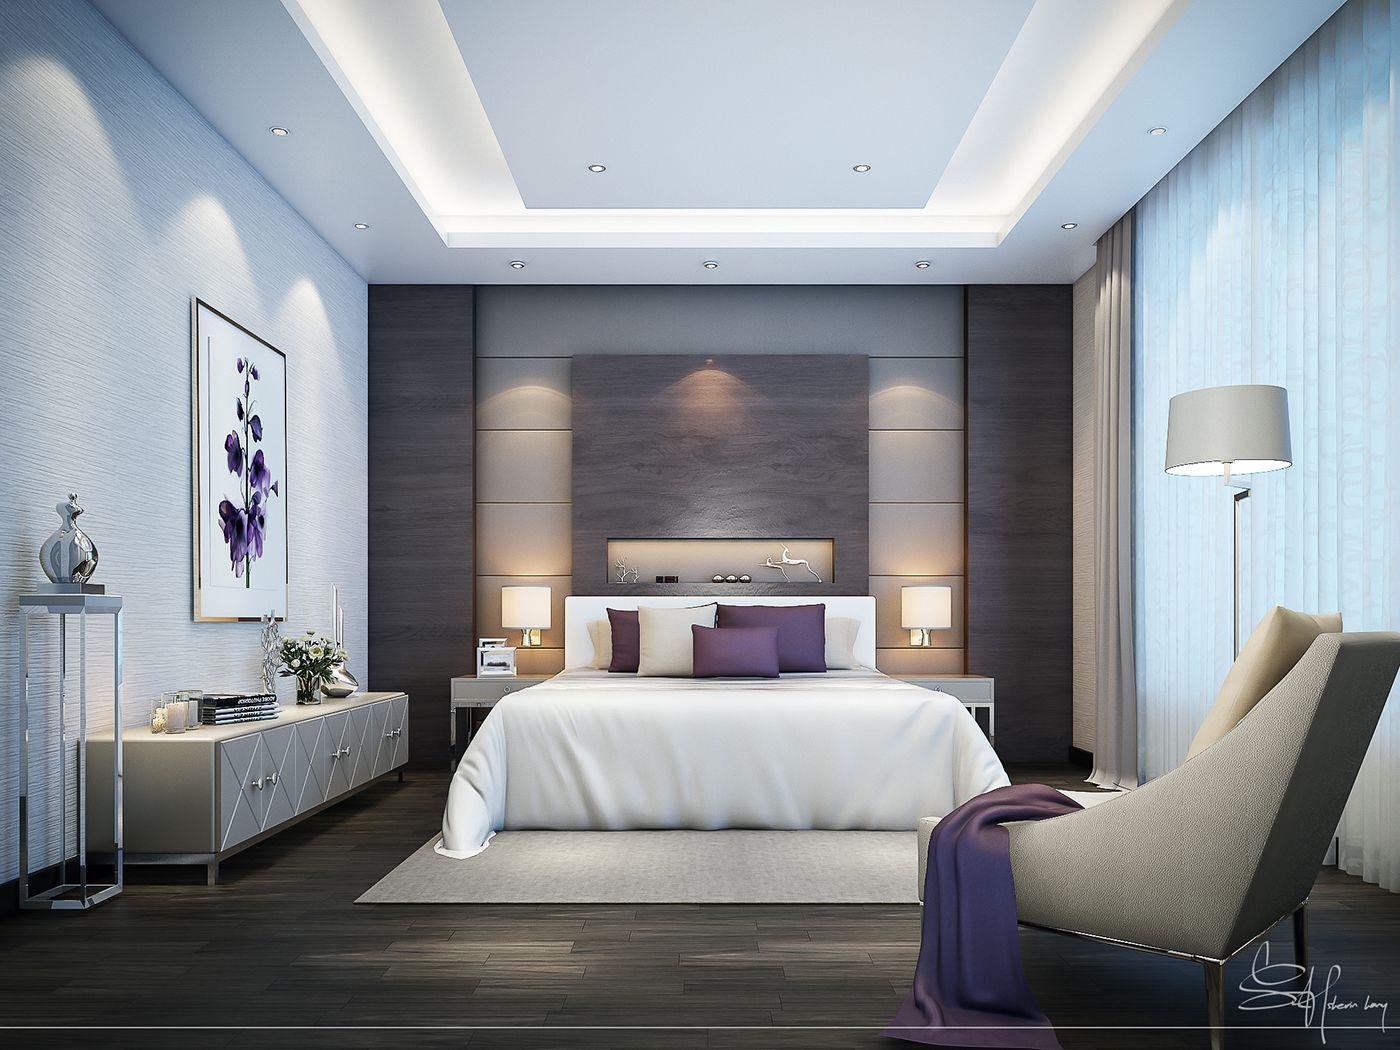 Contemporary Bedroom Interior design on Behance | Interior ...